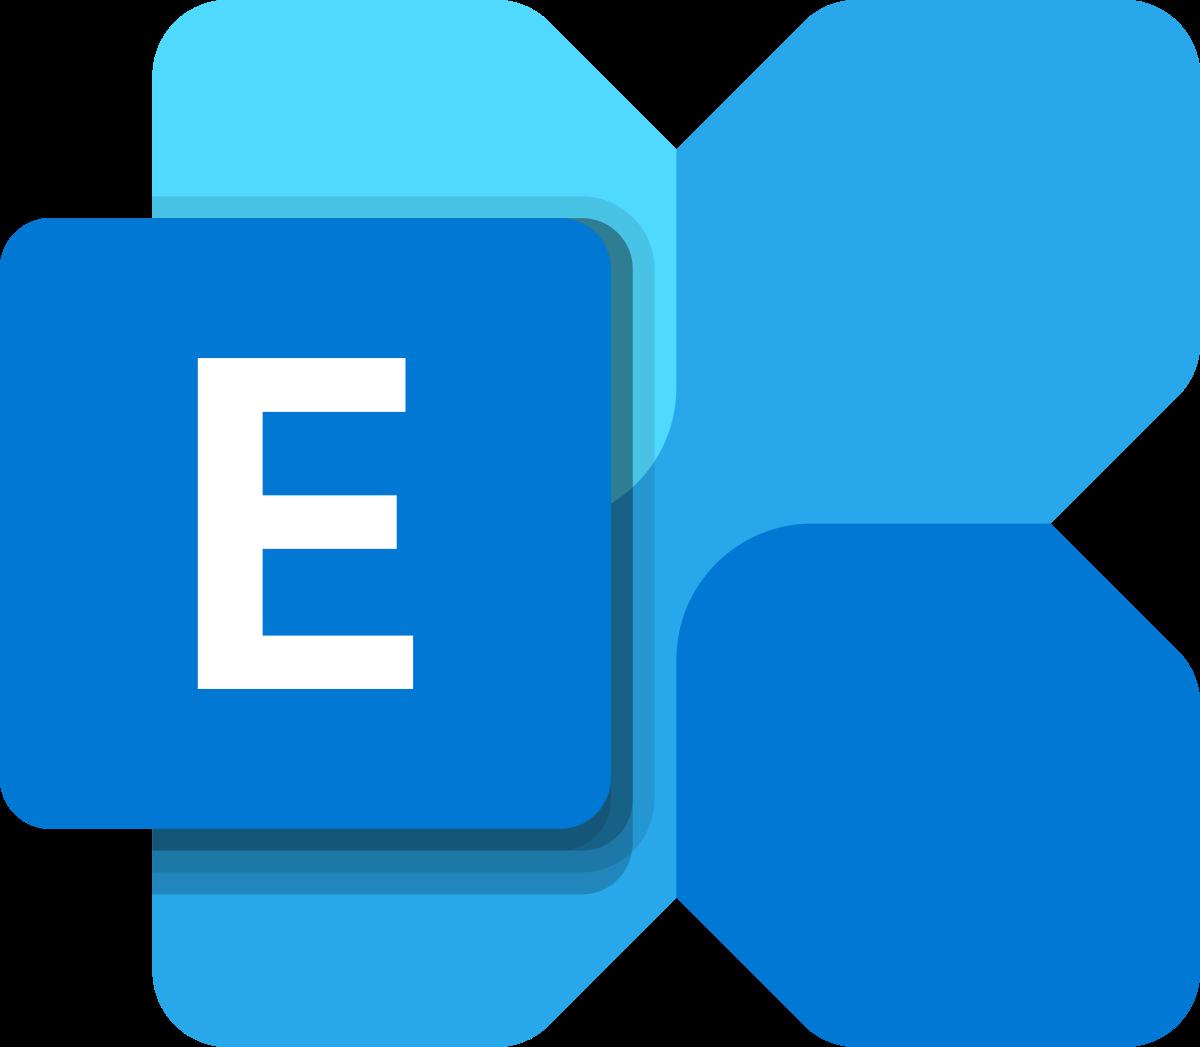 logo Microsoft Exchange messagerie